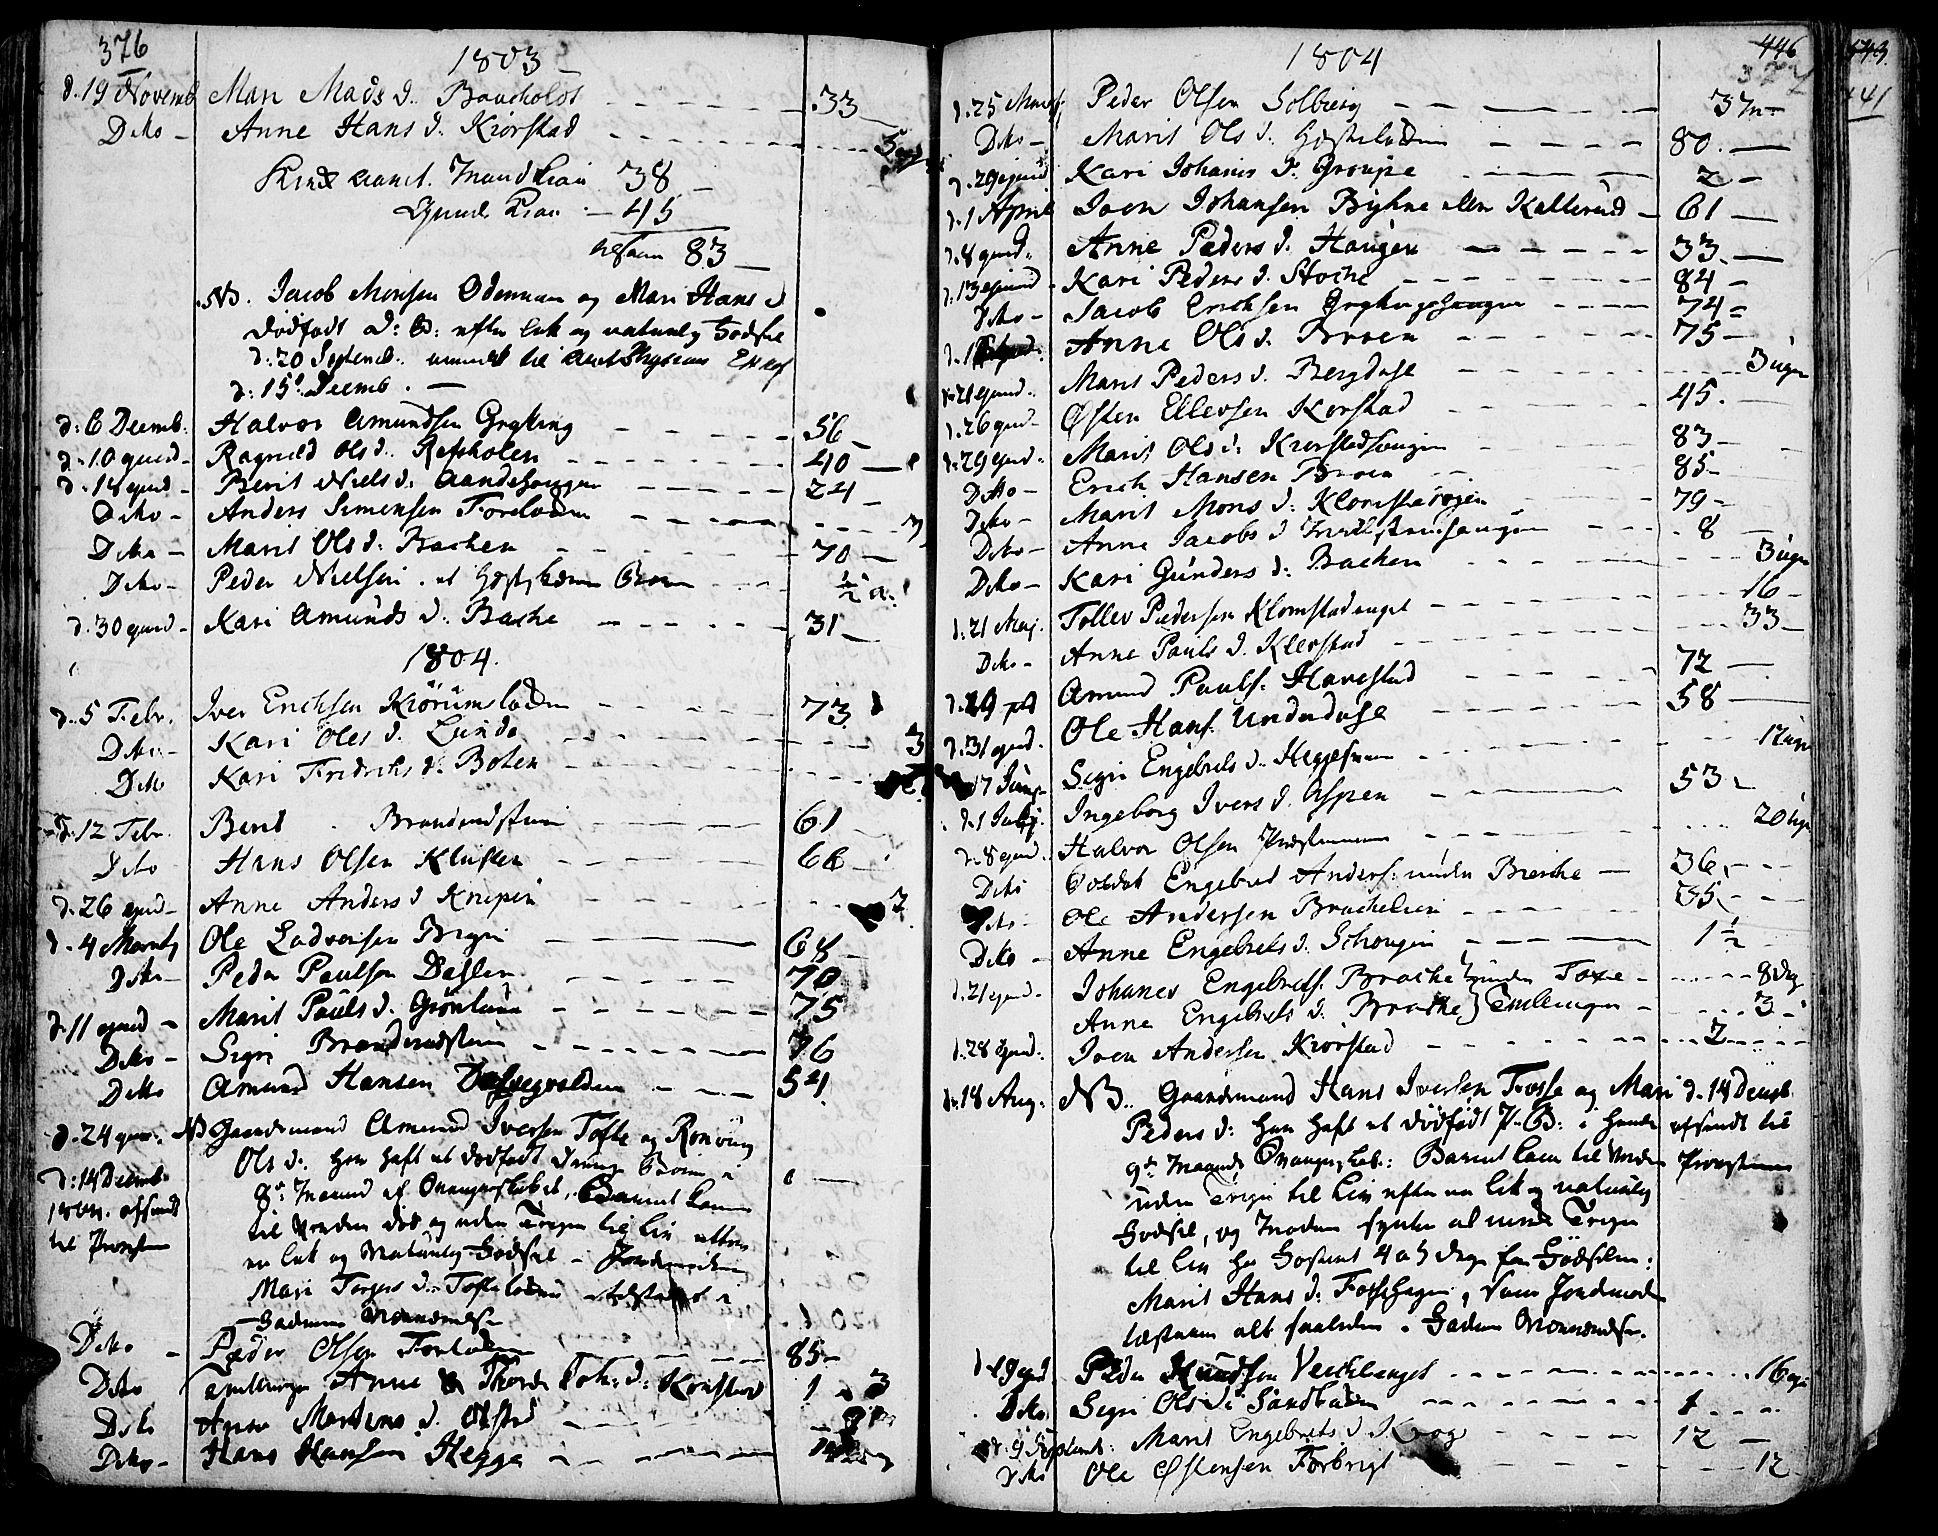 SAH, Fron prestekontor, H/Ha/Haa/L0001: Ministerialbok nr. 1, 1799-1816, s. 376-377